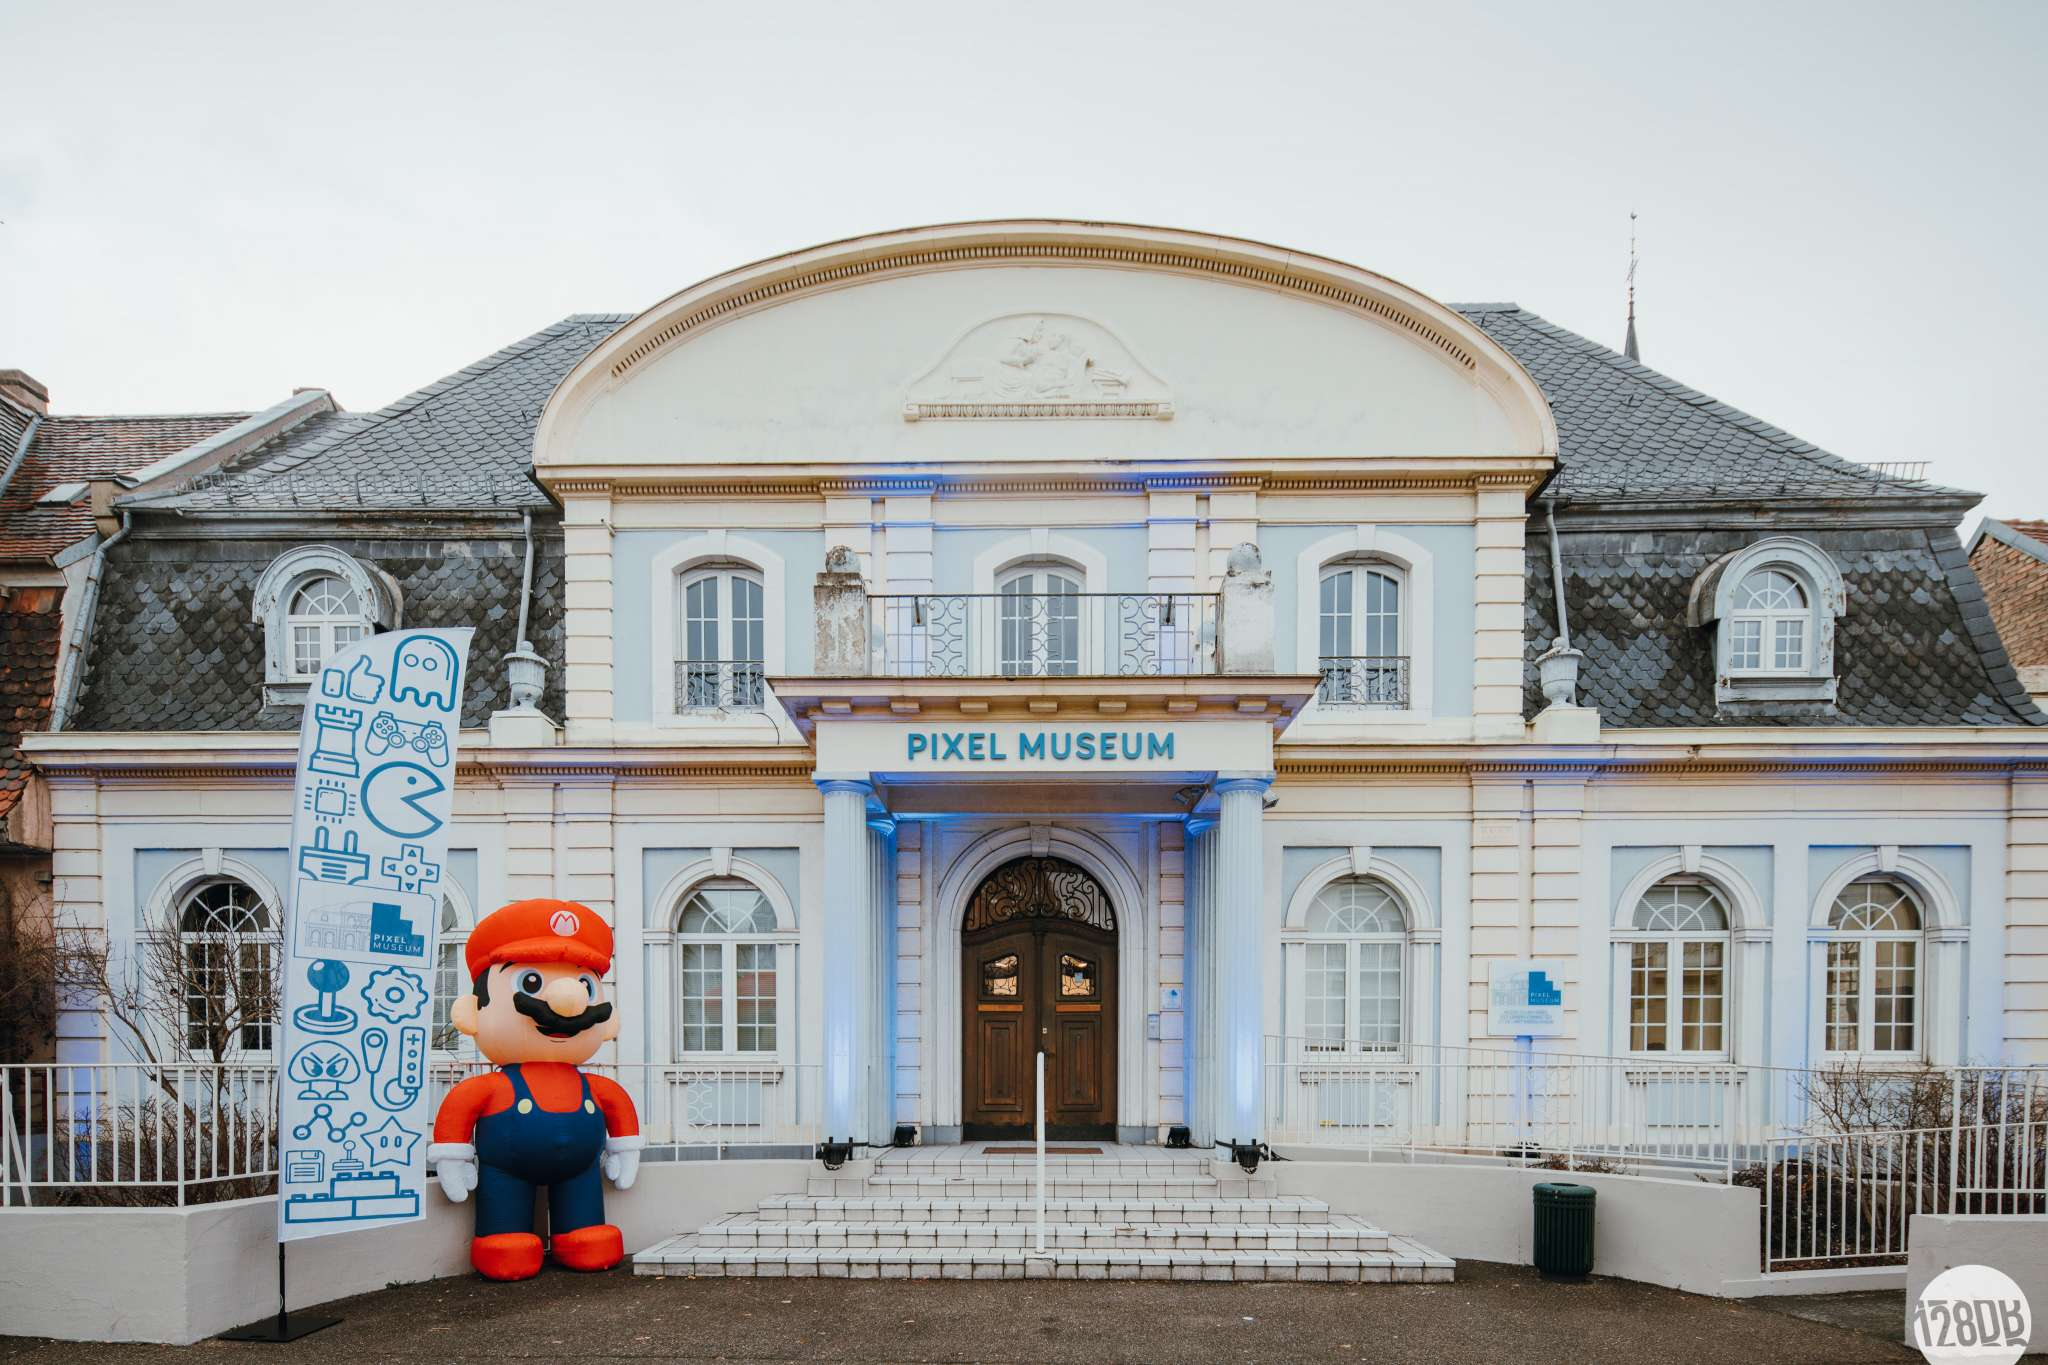 17-02-24-inauguration-pixel-museum-bartosch-salmanski-128db-fr-0024